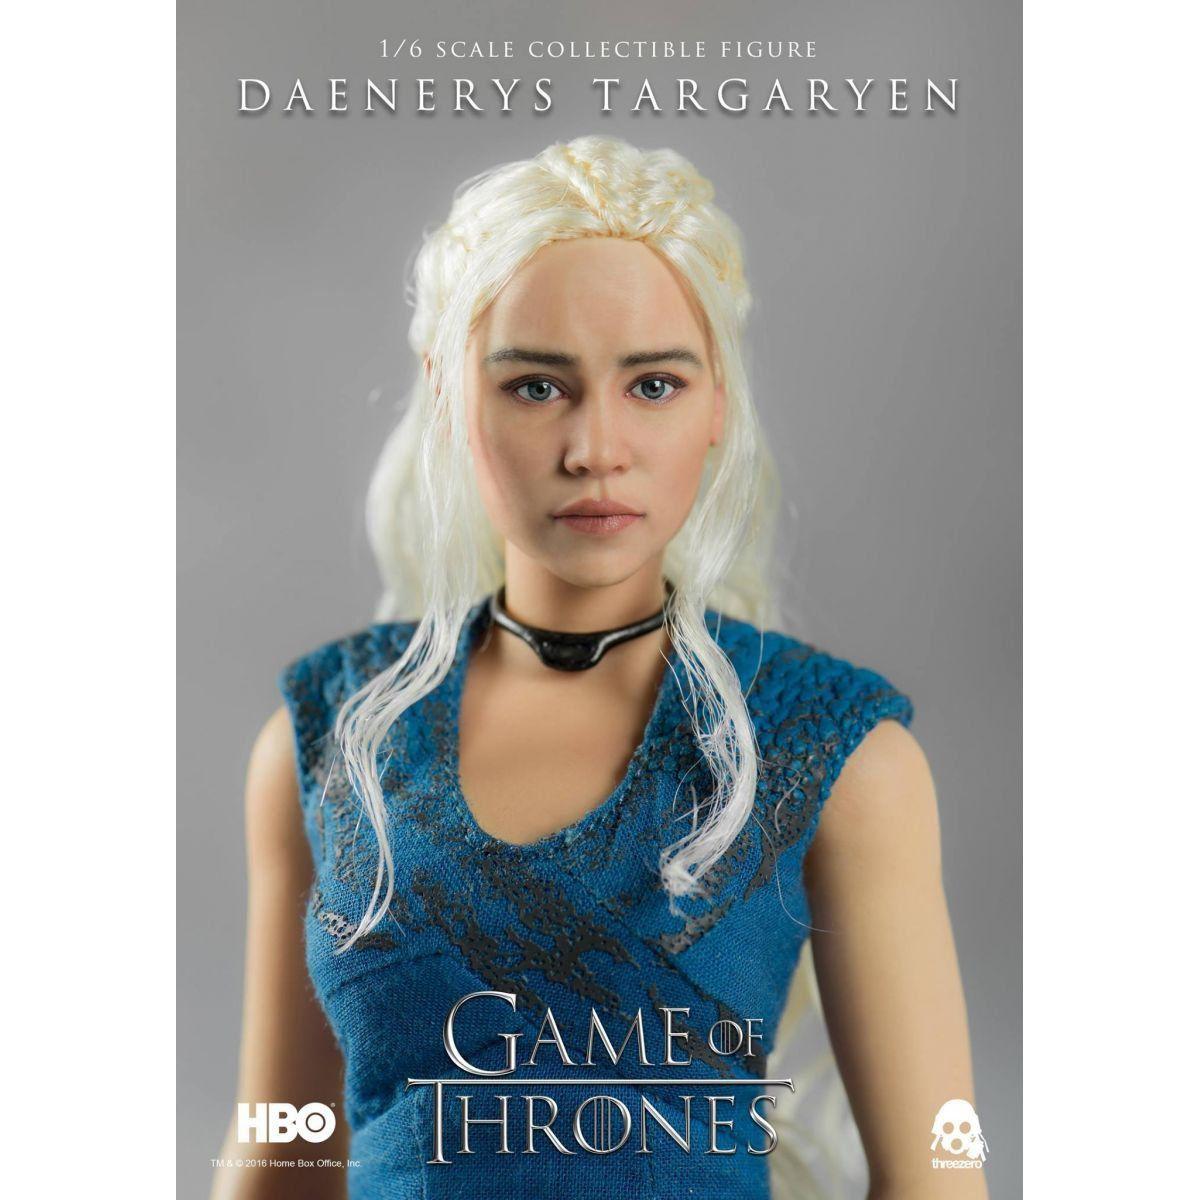 Boneco Daenerys Targaryen: Game of Thrones Escala 1/6 - ThreeA